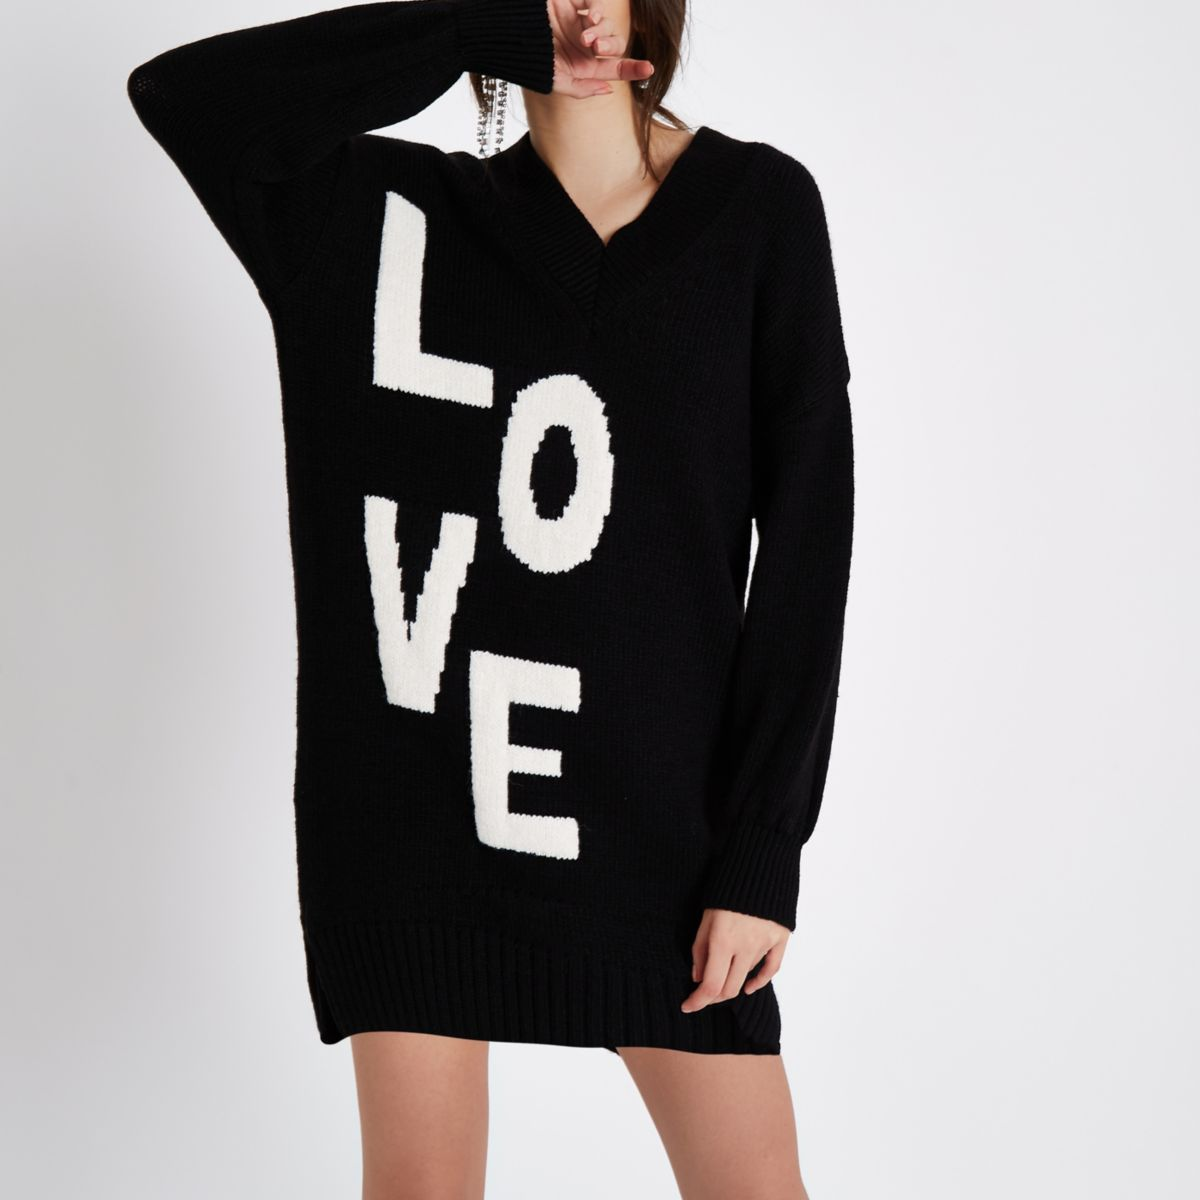 Black 'love' V neck sweater dress